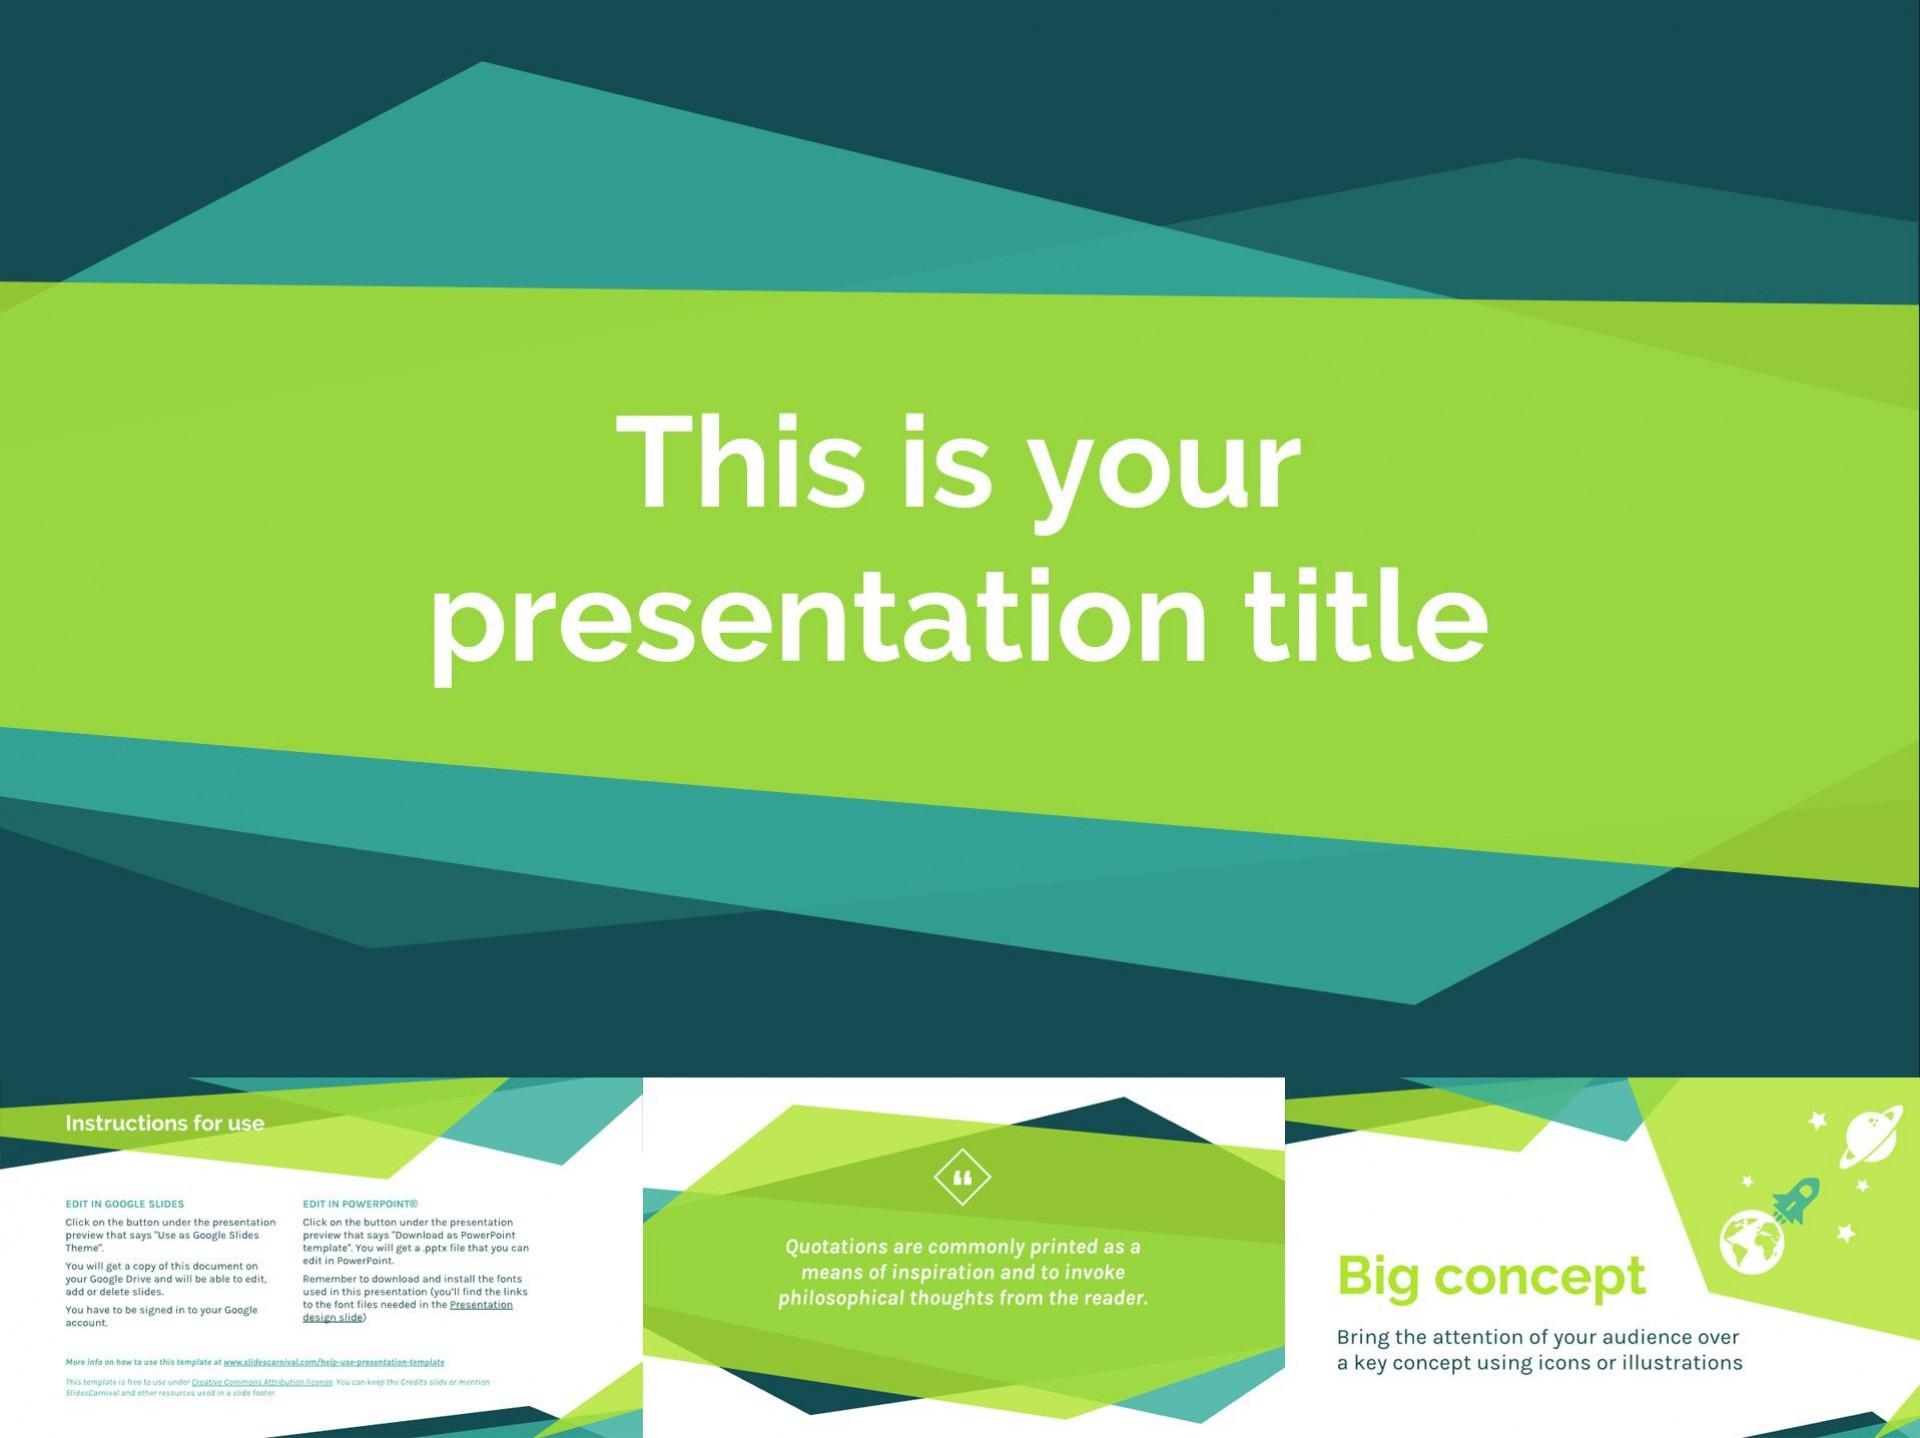 007 Stunning Google Doc Powerpoint Template Image  Templates Presentation1920